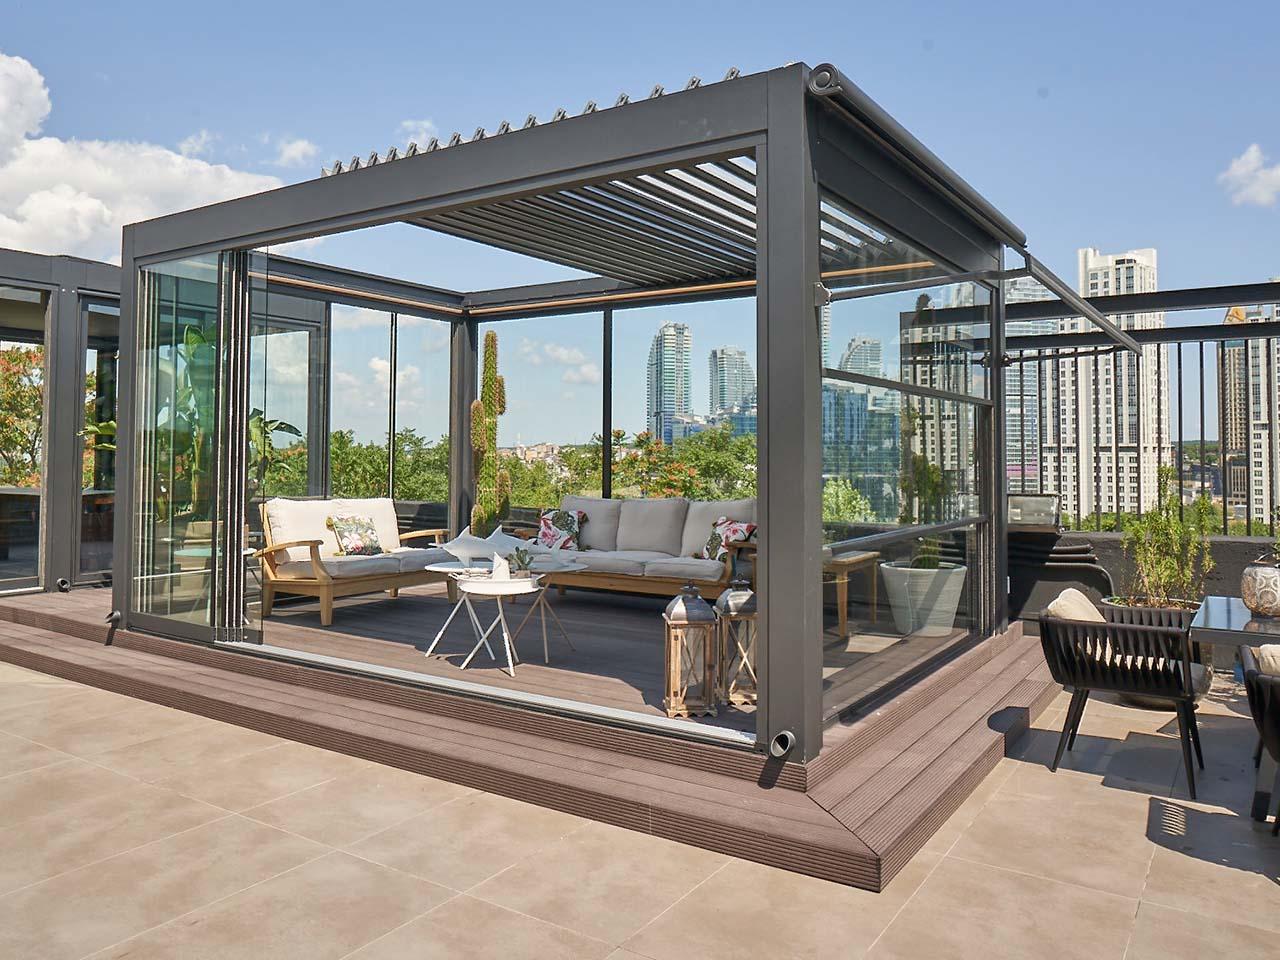 lamellendach skyroofprestige palmiye terrassenueberdachung lounge mudo 8 - Auffahrbares Lamellendach Skyroof Prestige